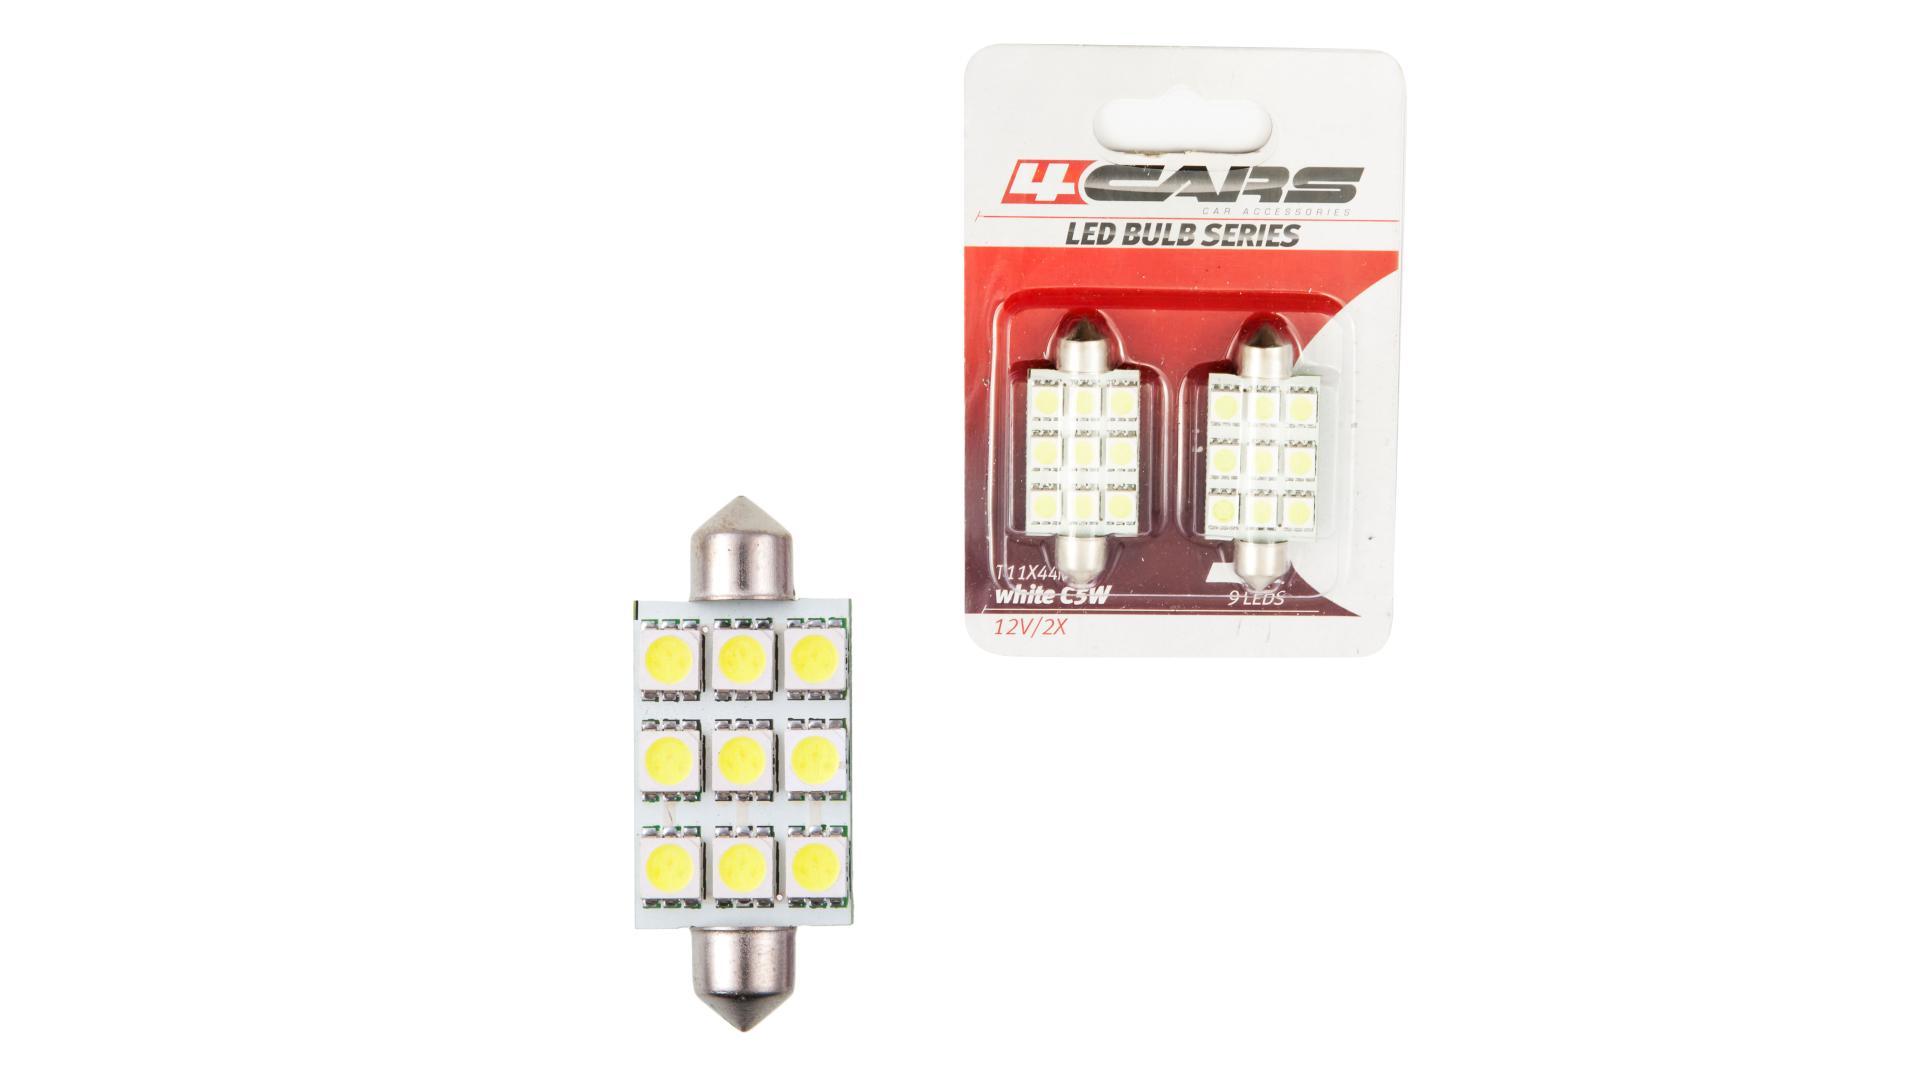 4CARS LED žárovka 9LED 12V Festoon 5050SMD T11x44mm